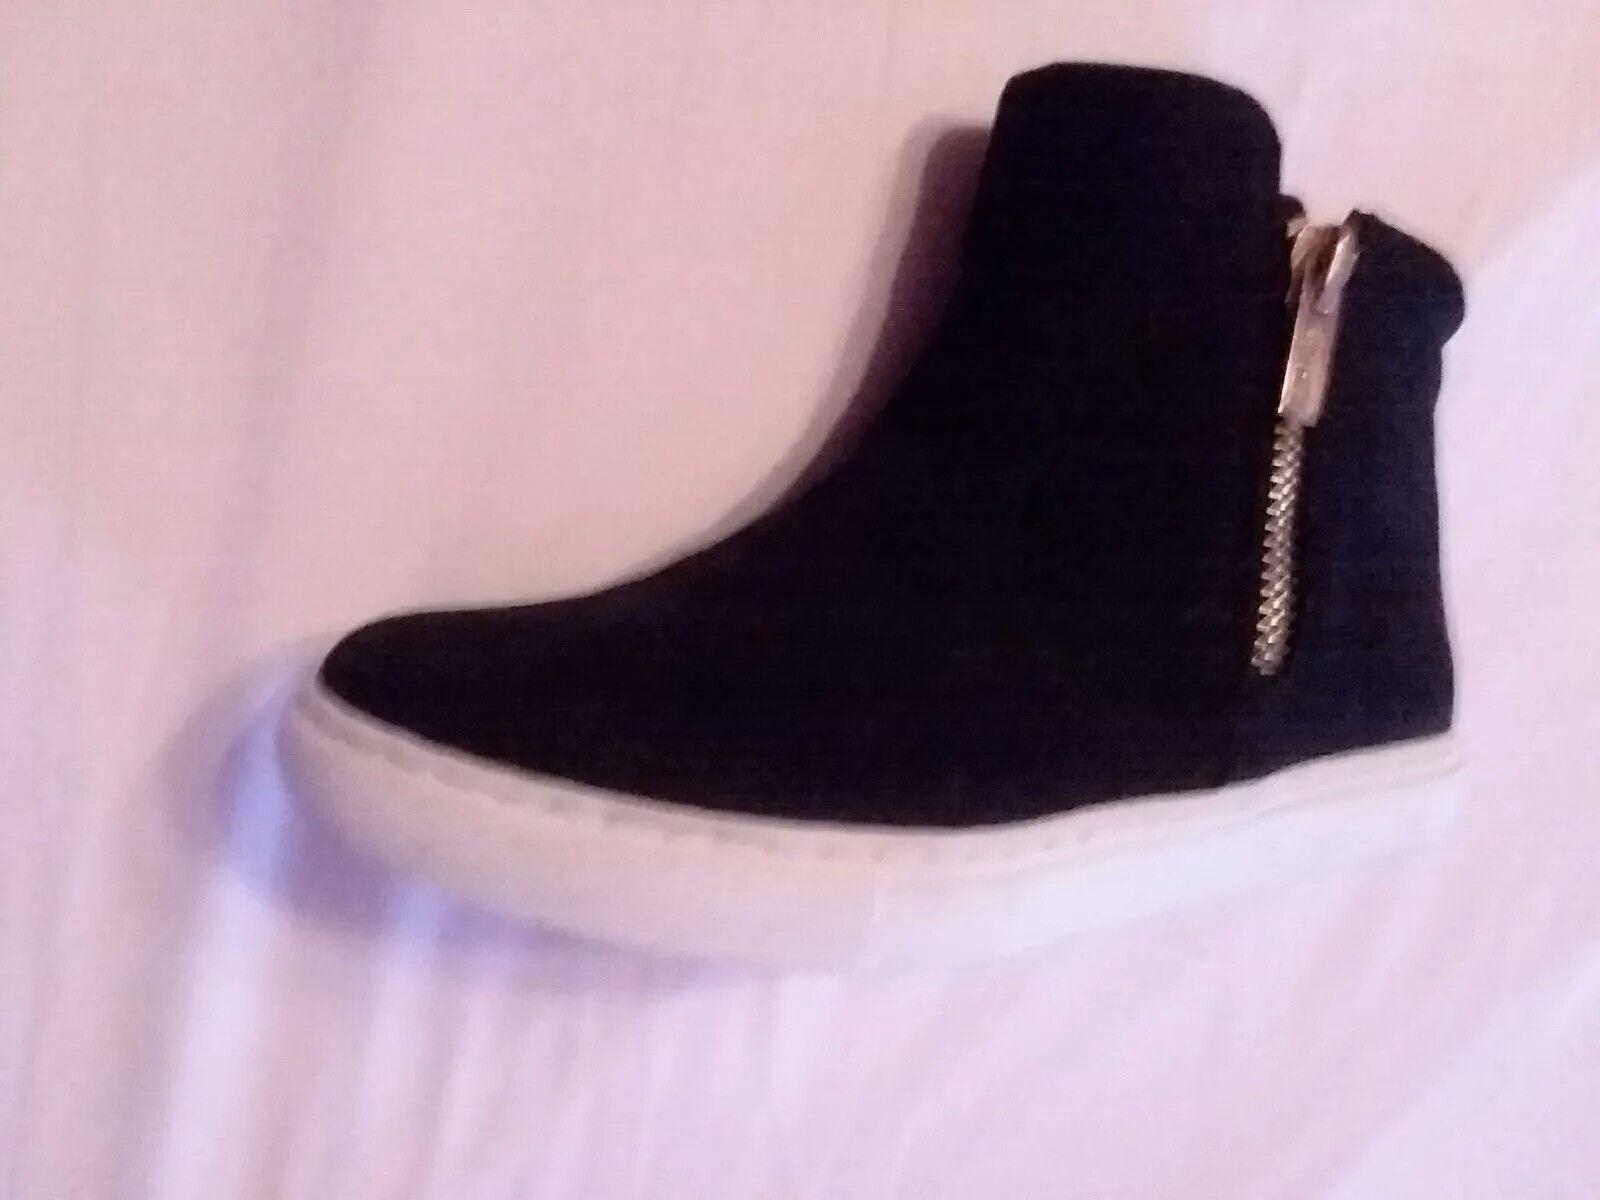 Kenneth Cole josie new York zip high top kiera femmes  sneakers